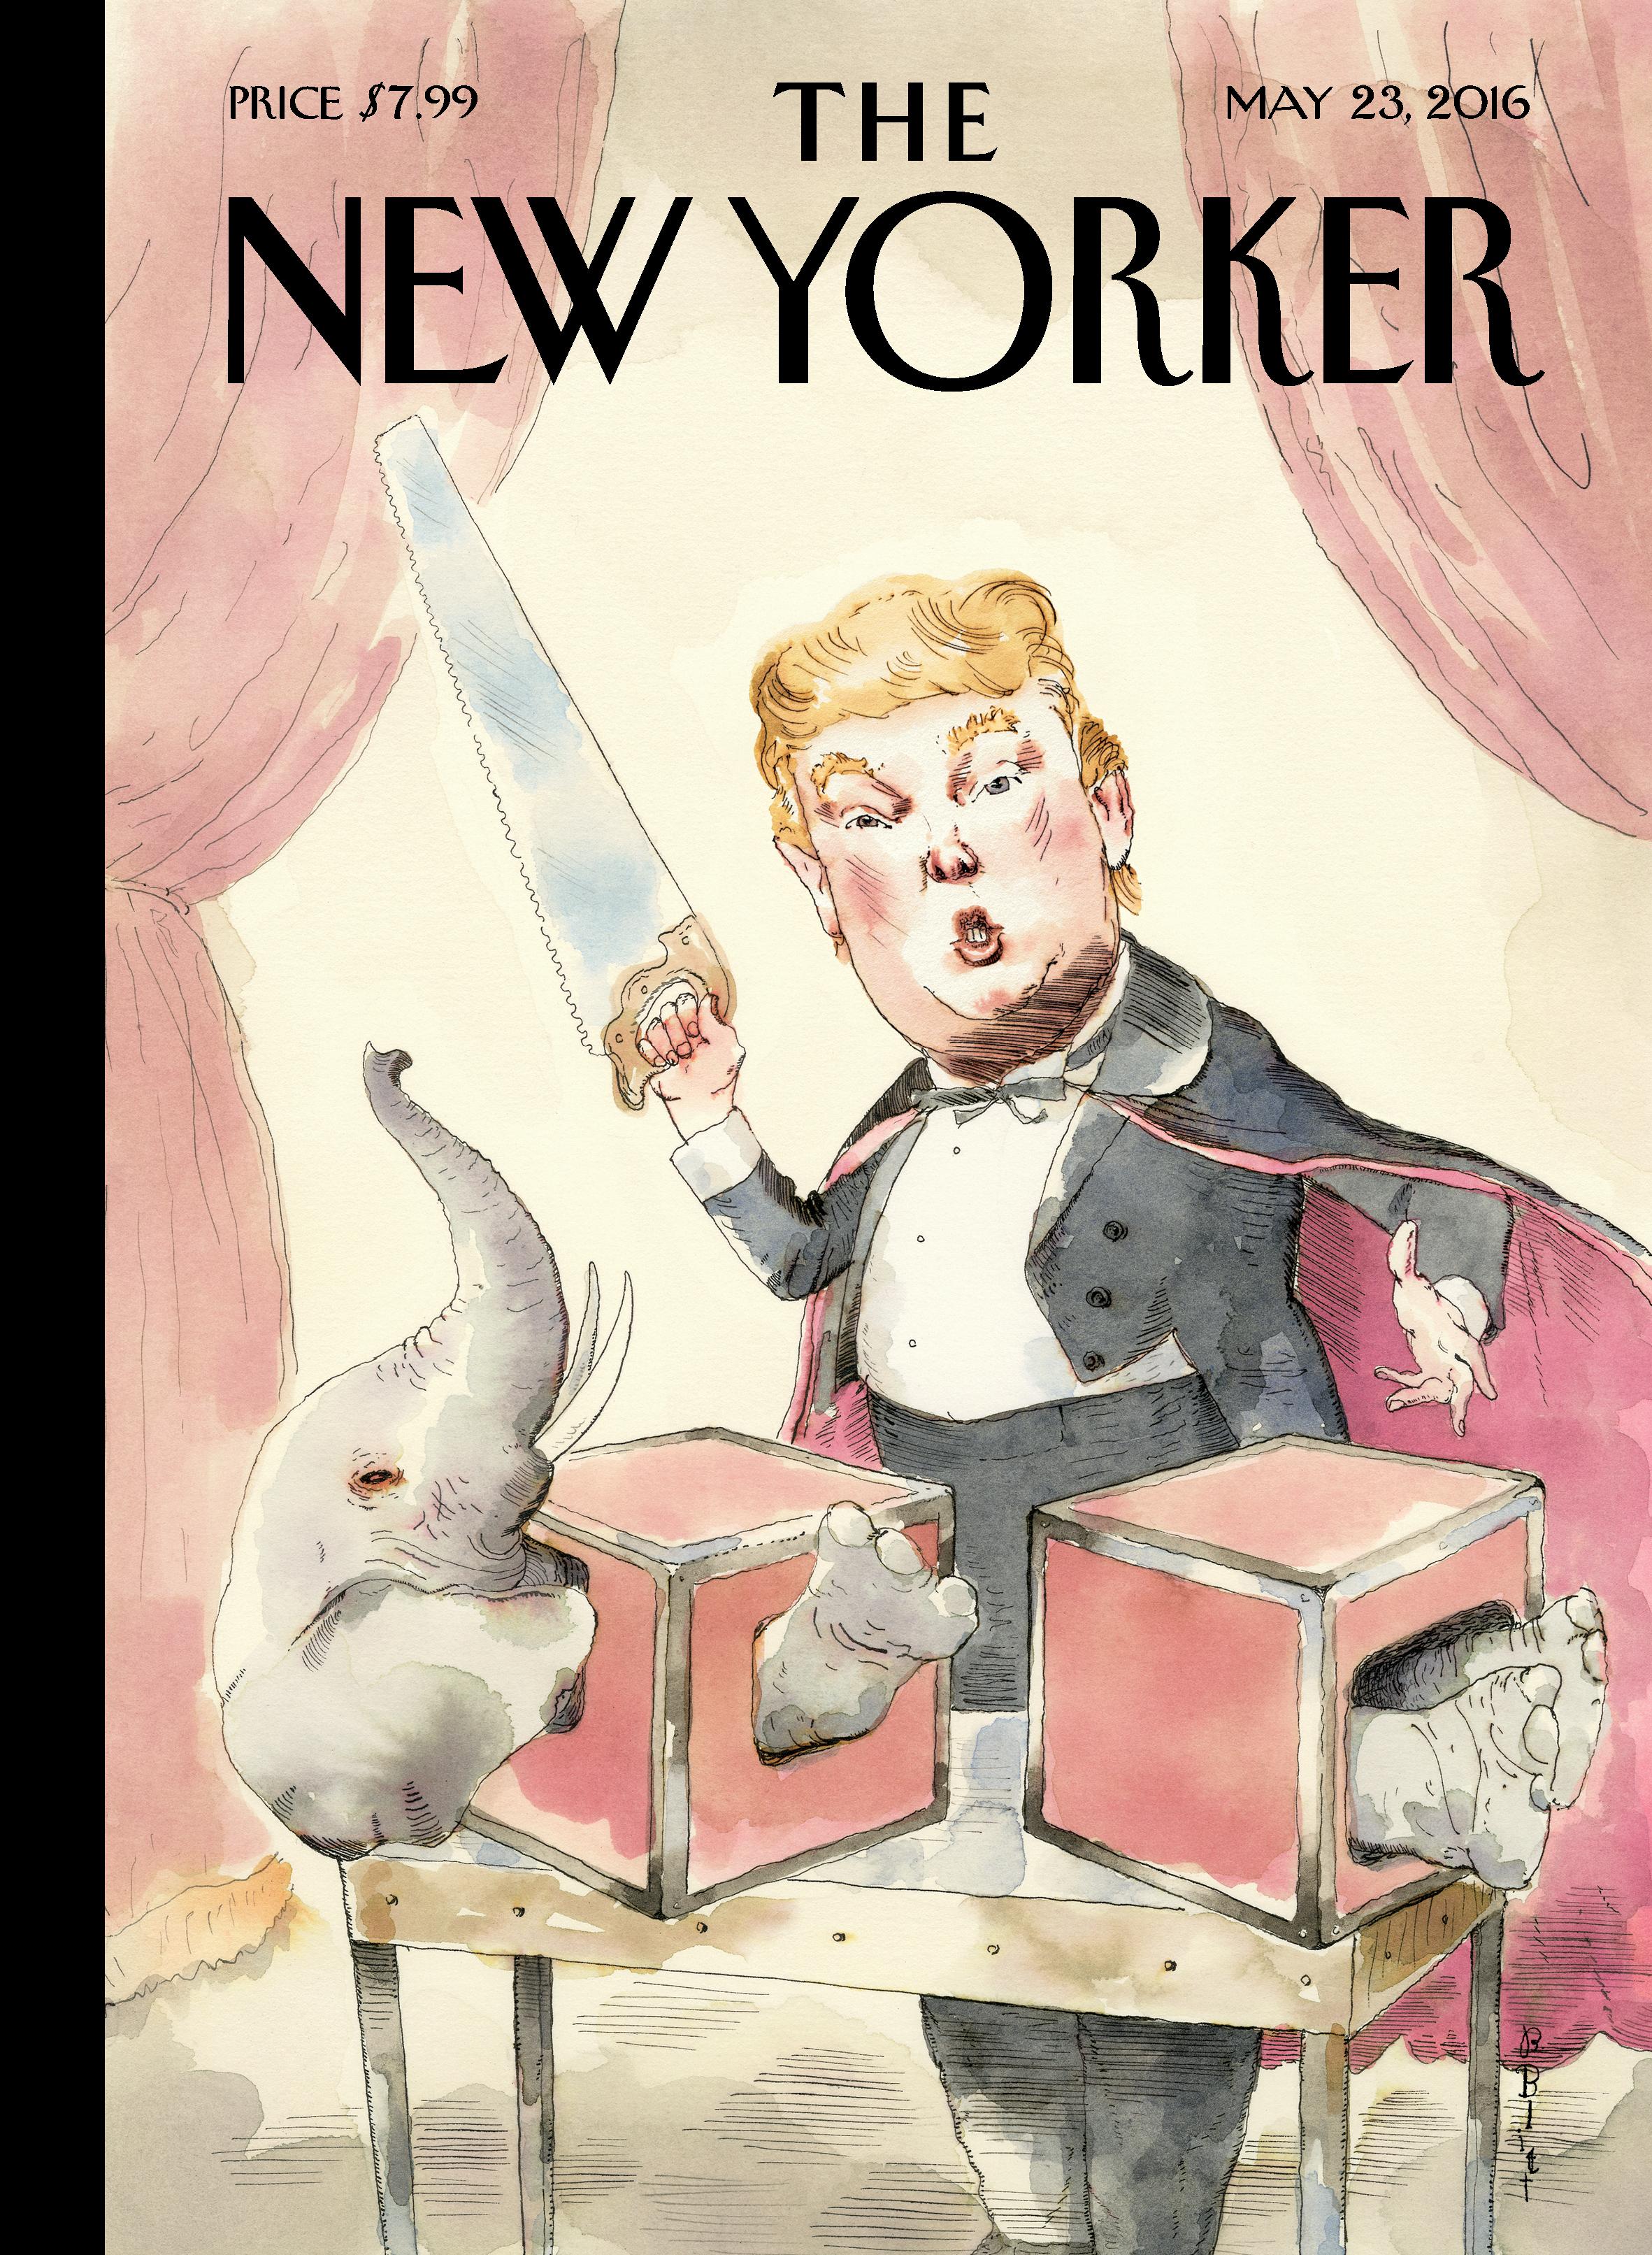 2016_05_23_Blitt_Trump_Sleight_of_Hand.jpg